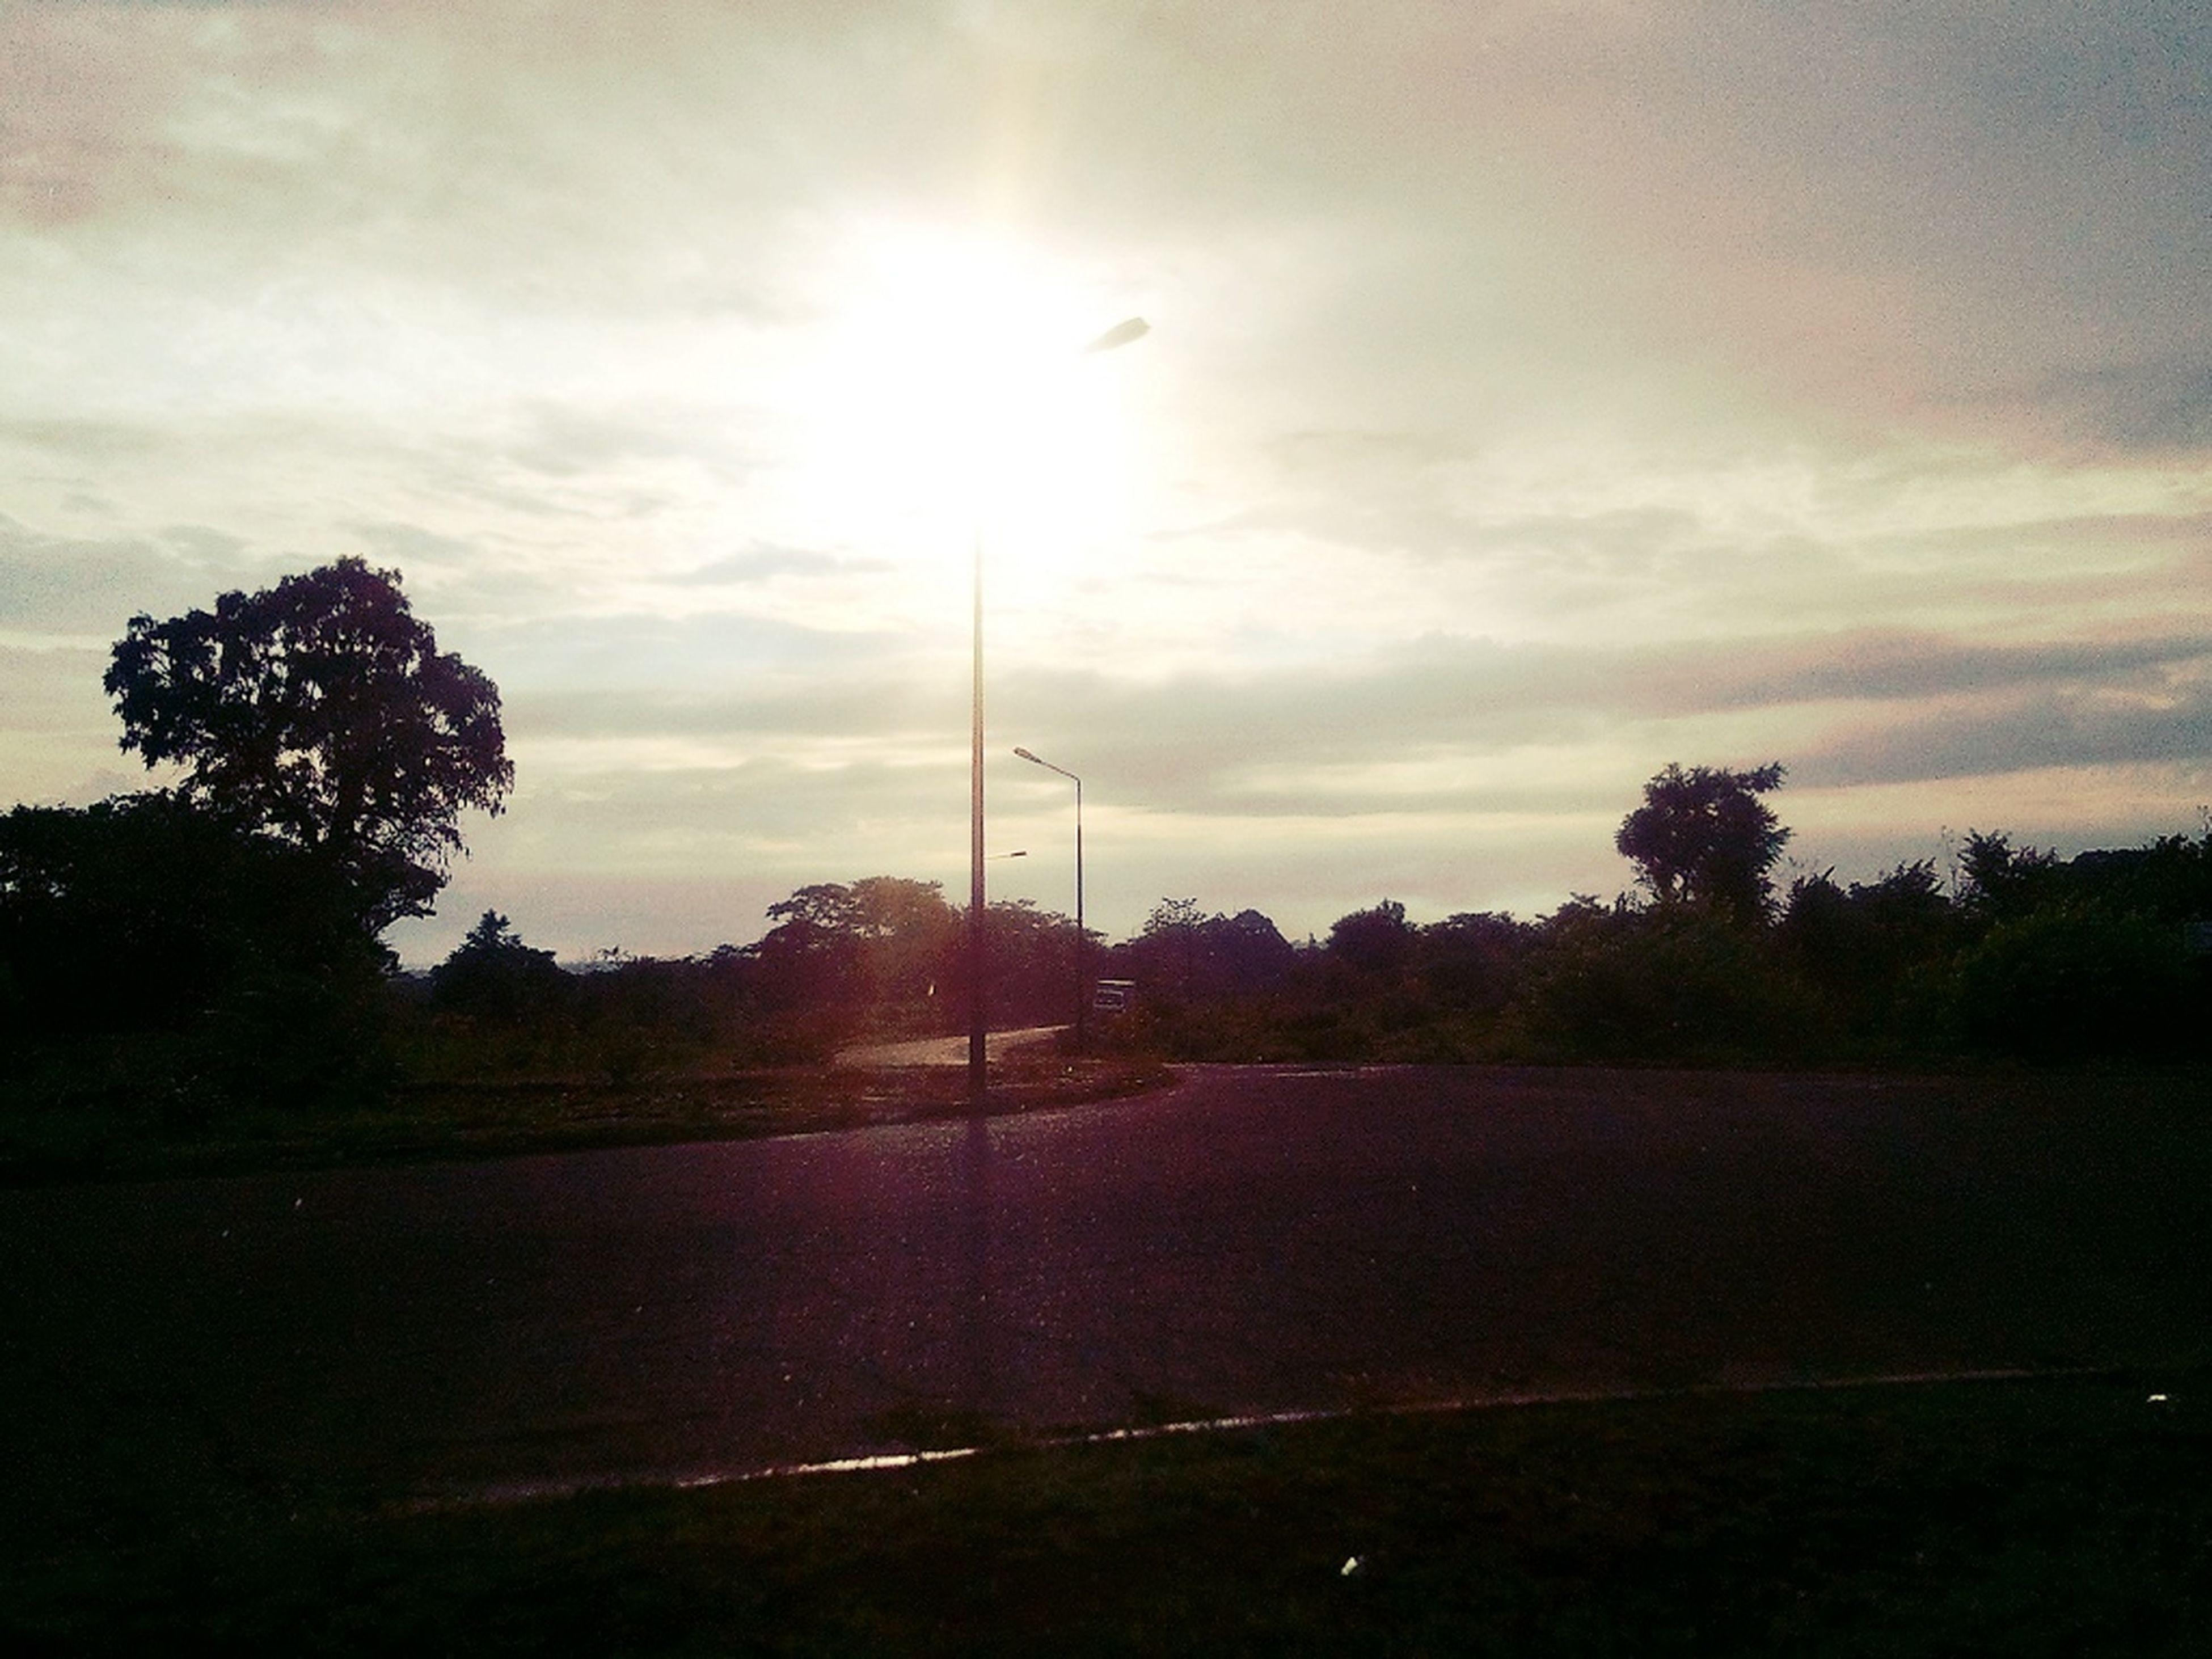 tree, sky, cloud - sky, sun, tranquility, tranquil scene, scenics, nature, beauty in nature, silhouette, sunset, sunlight, cloudy, landscape, field, cloud, sunbeam, grass, street light, road